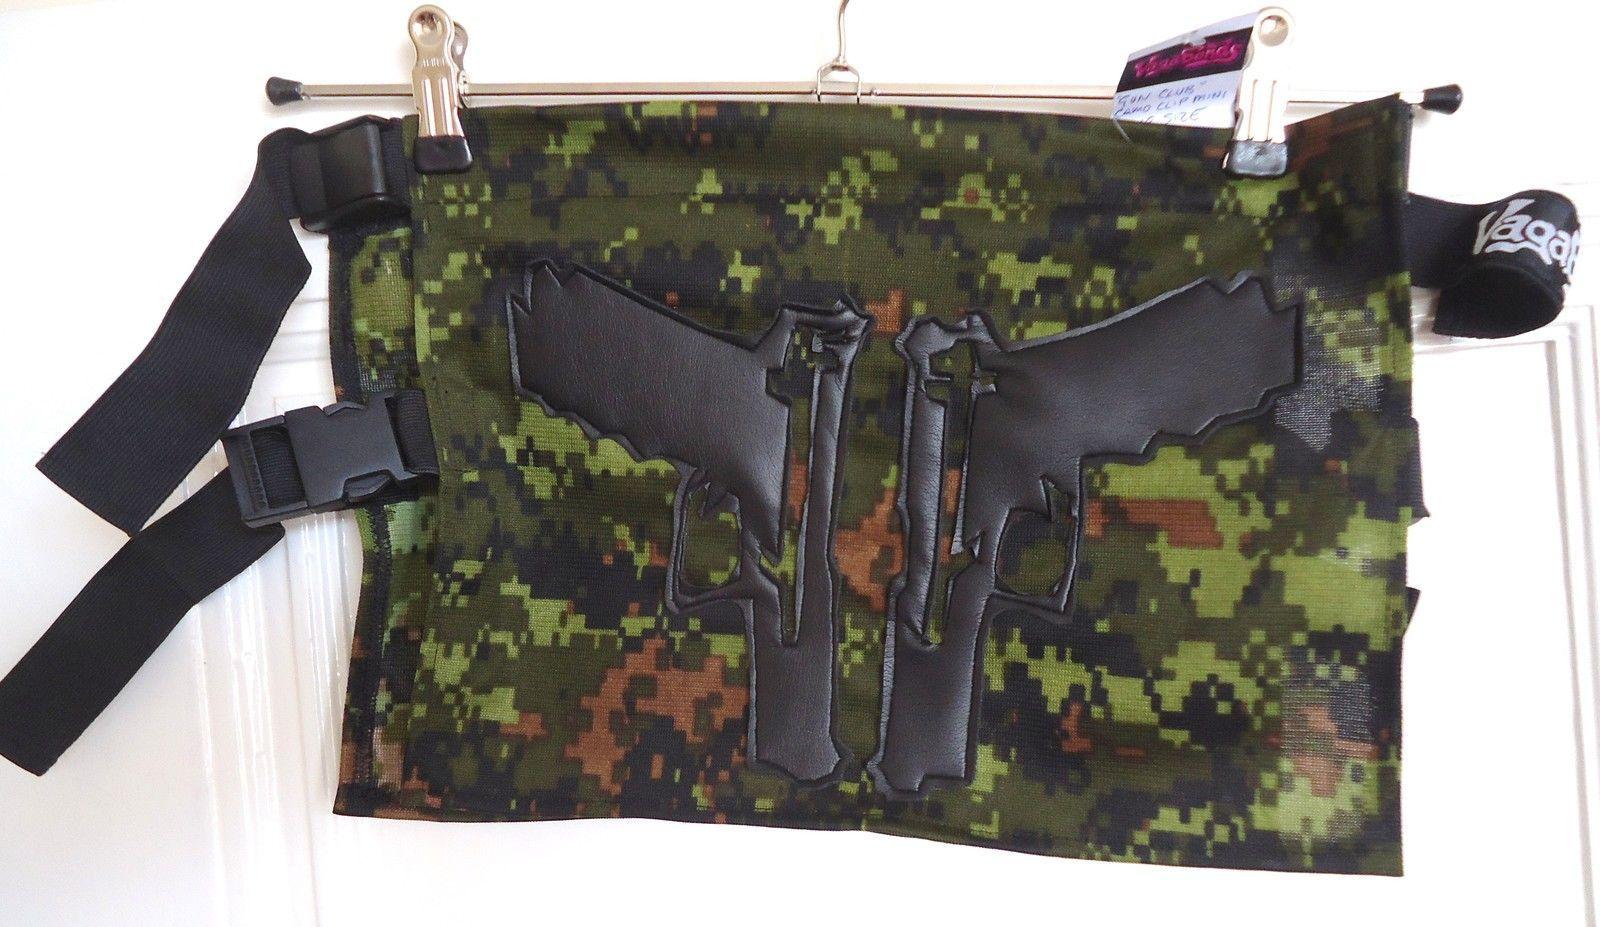 Glock applique mini skirt bumflap style with adjustable sideclips